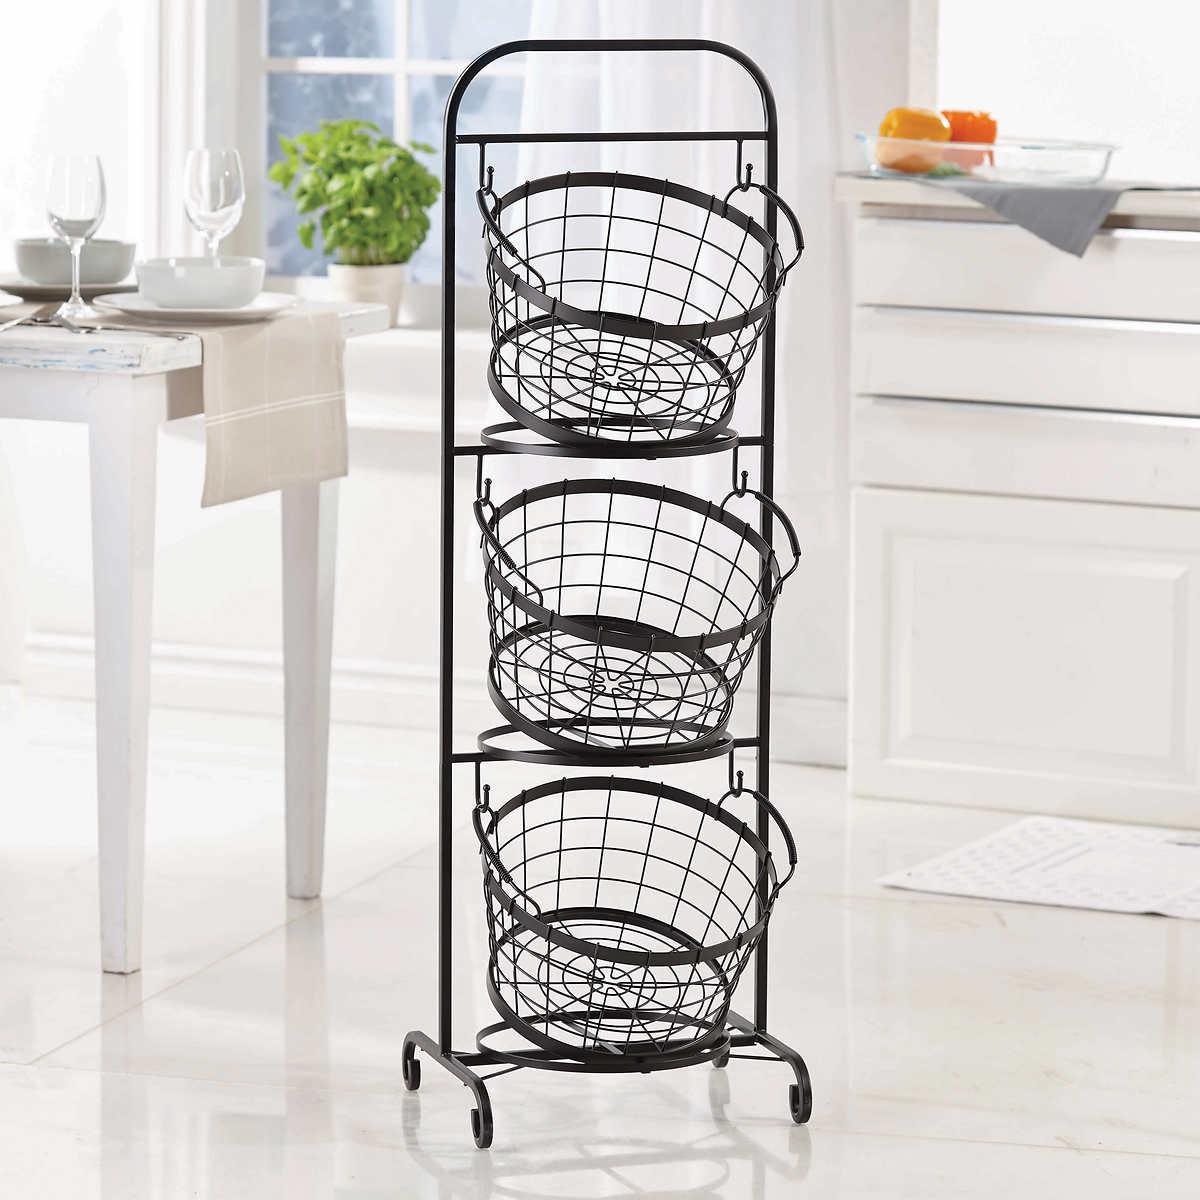 Mesa 3-tier Wrought Iron Market Baskets $24.99 at Costco